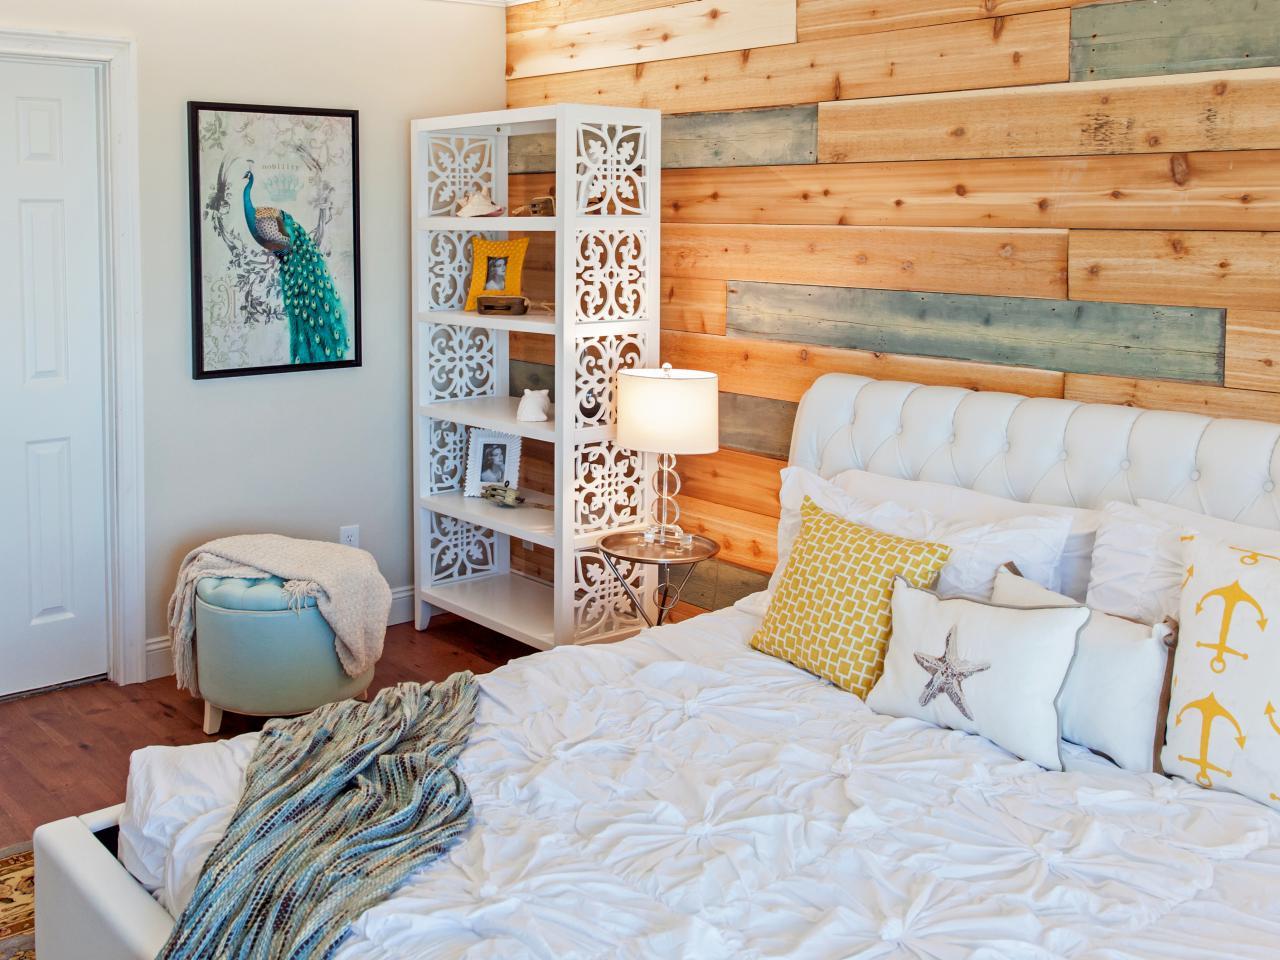 David bromstad 39 s beach house decorating tips beach flip for David bromstad bedroom designs